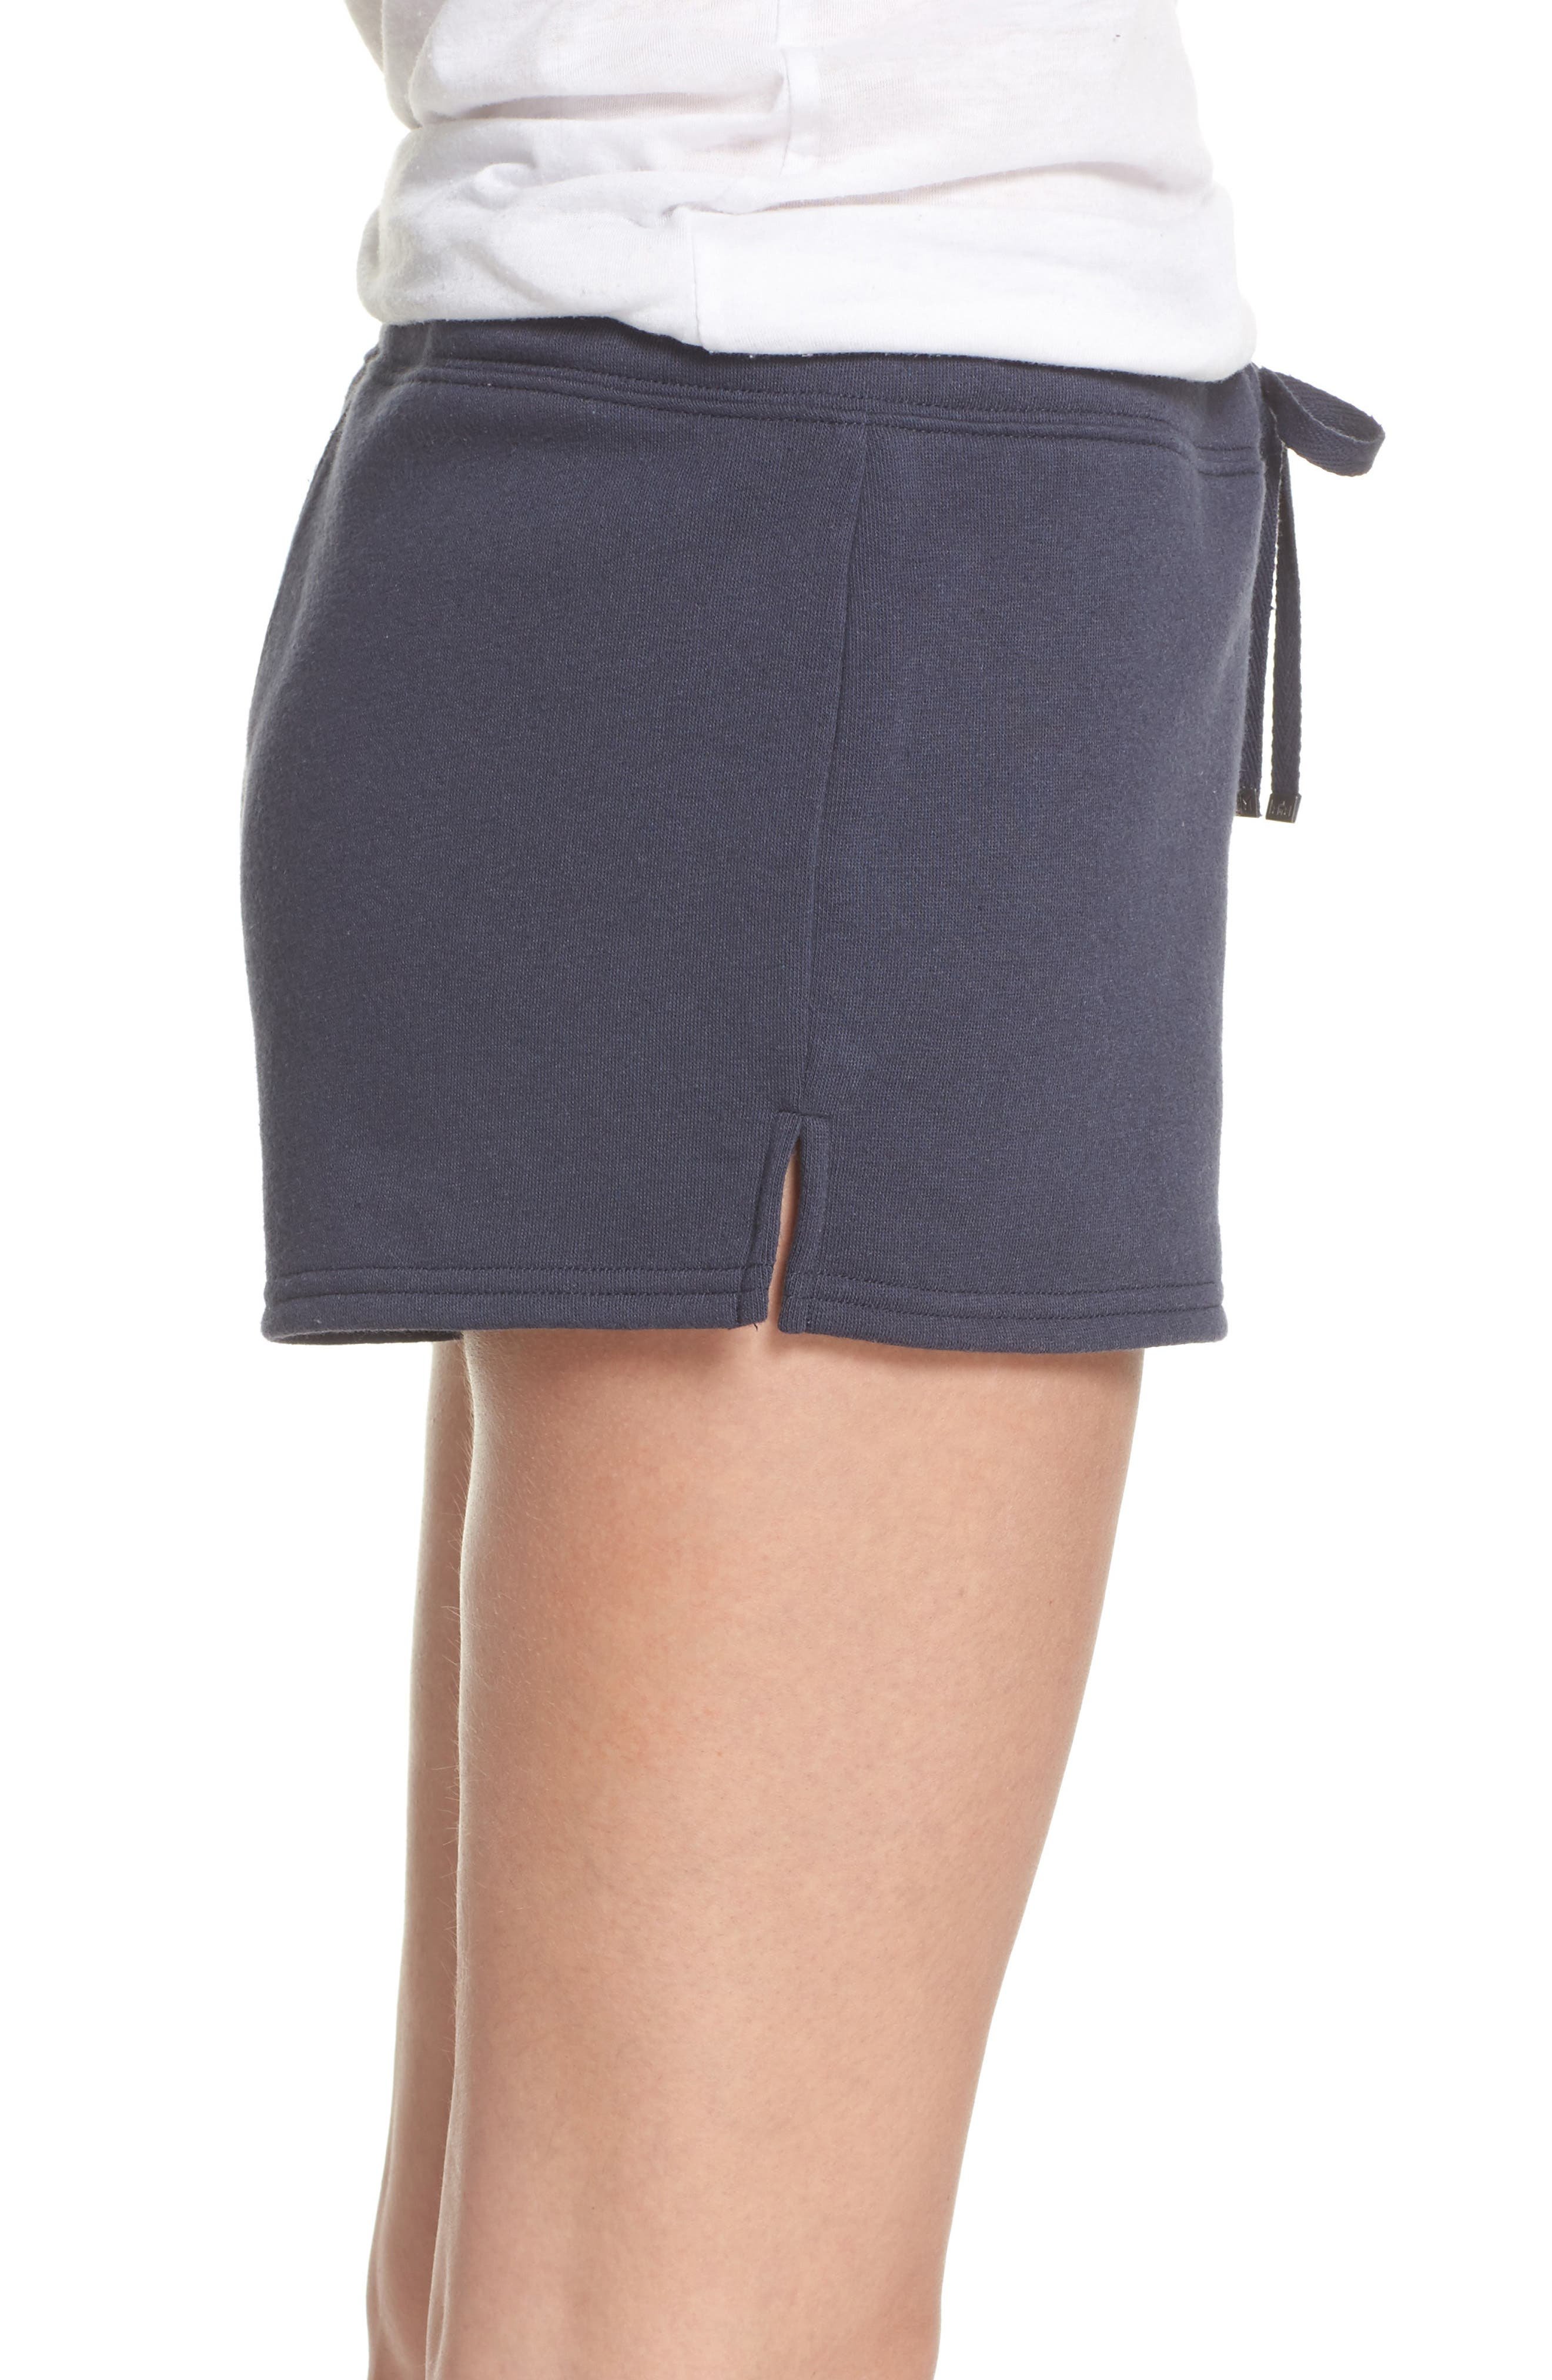 Take It Easy Lounge Shorts,                             Alternate thumbnail 3, color,                             Navy Blue